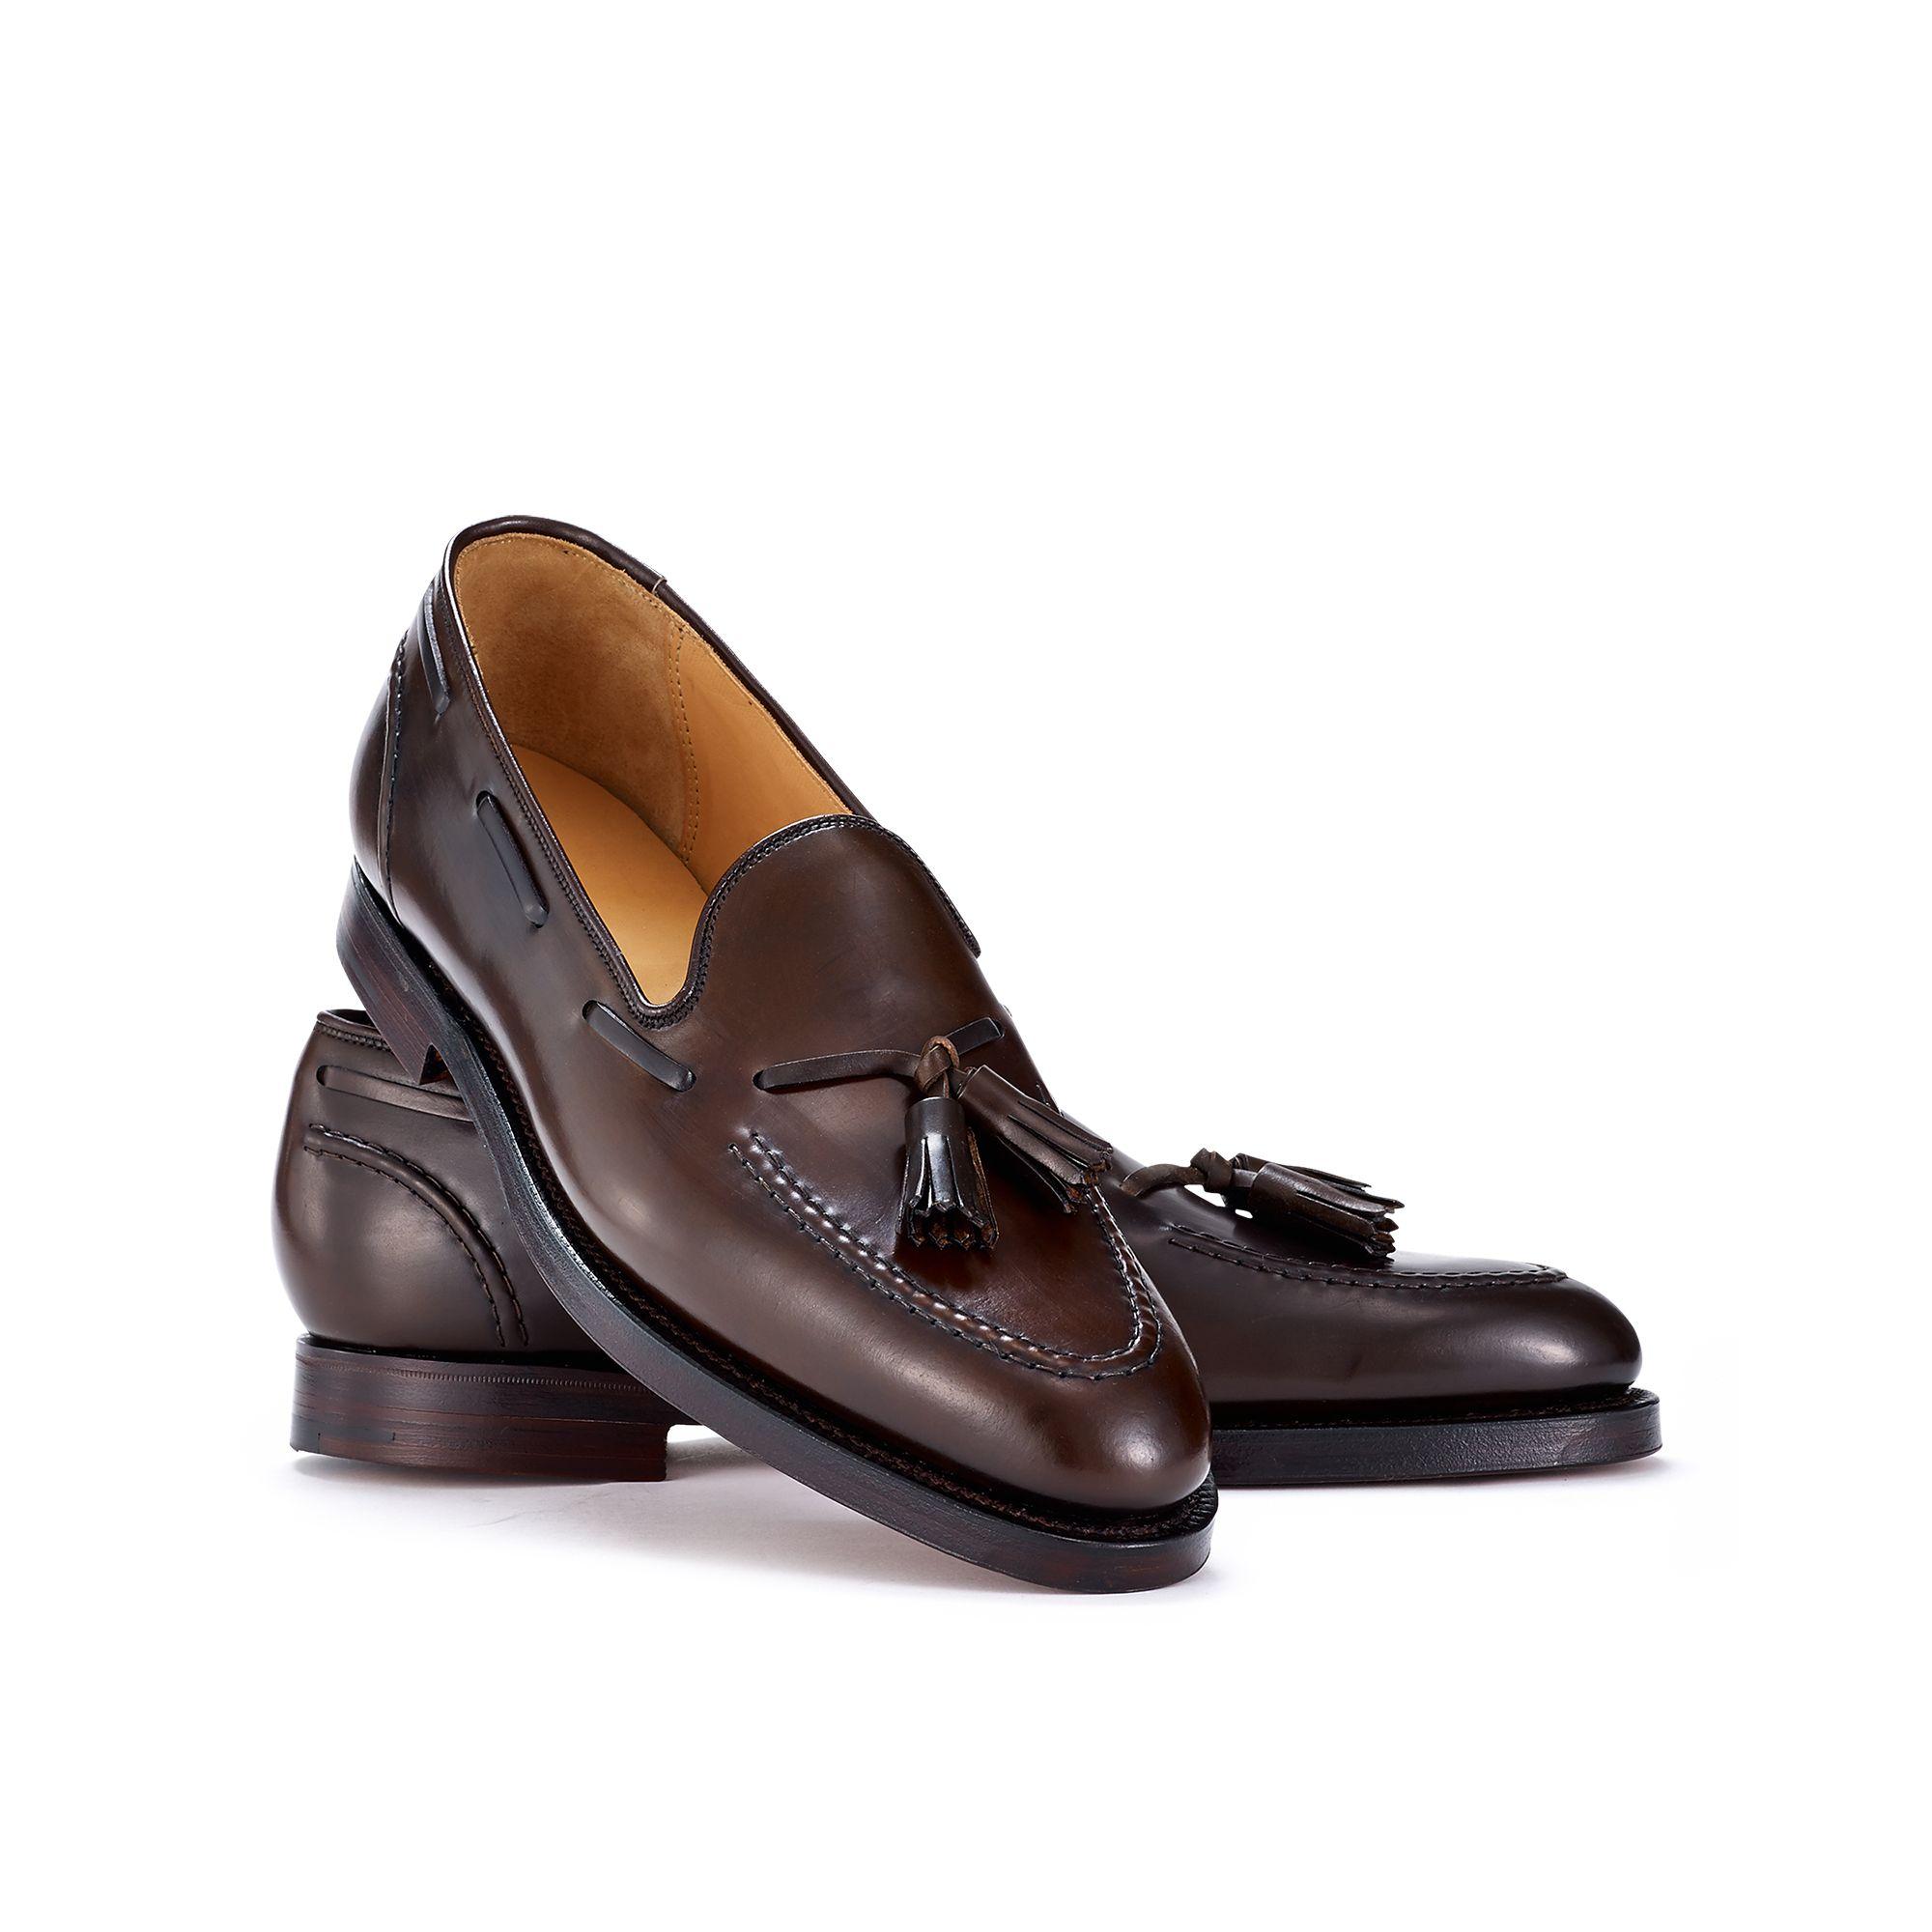 bf4fab7fd30 Ralph Lauren Cordovan Marlow Tassel Loafer in Brown for Men - Lyst